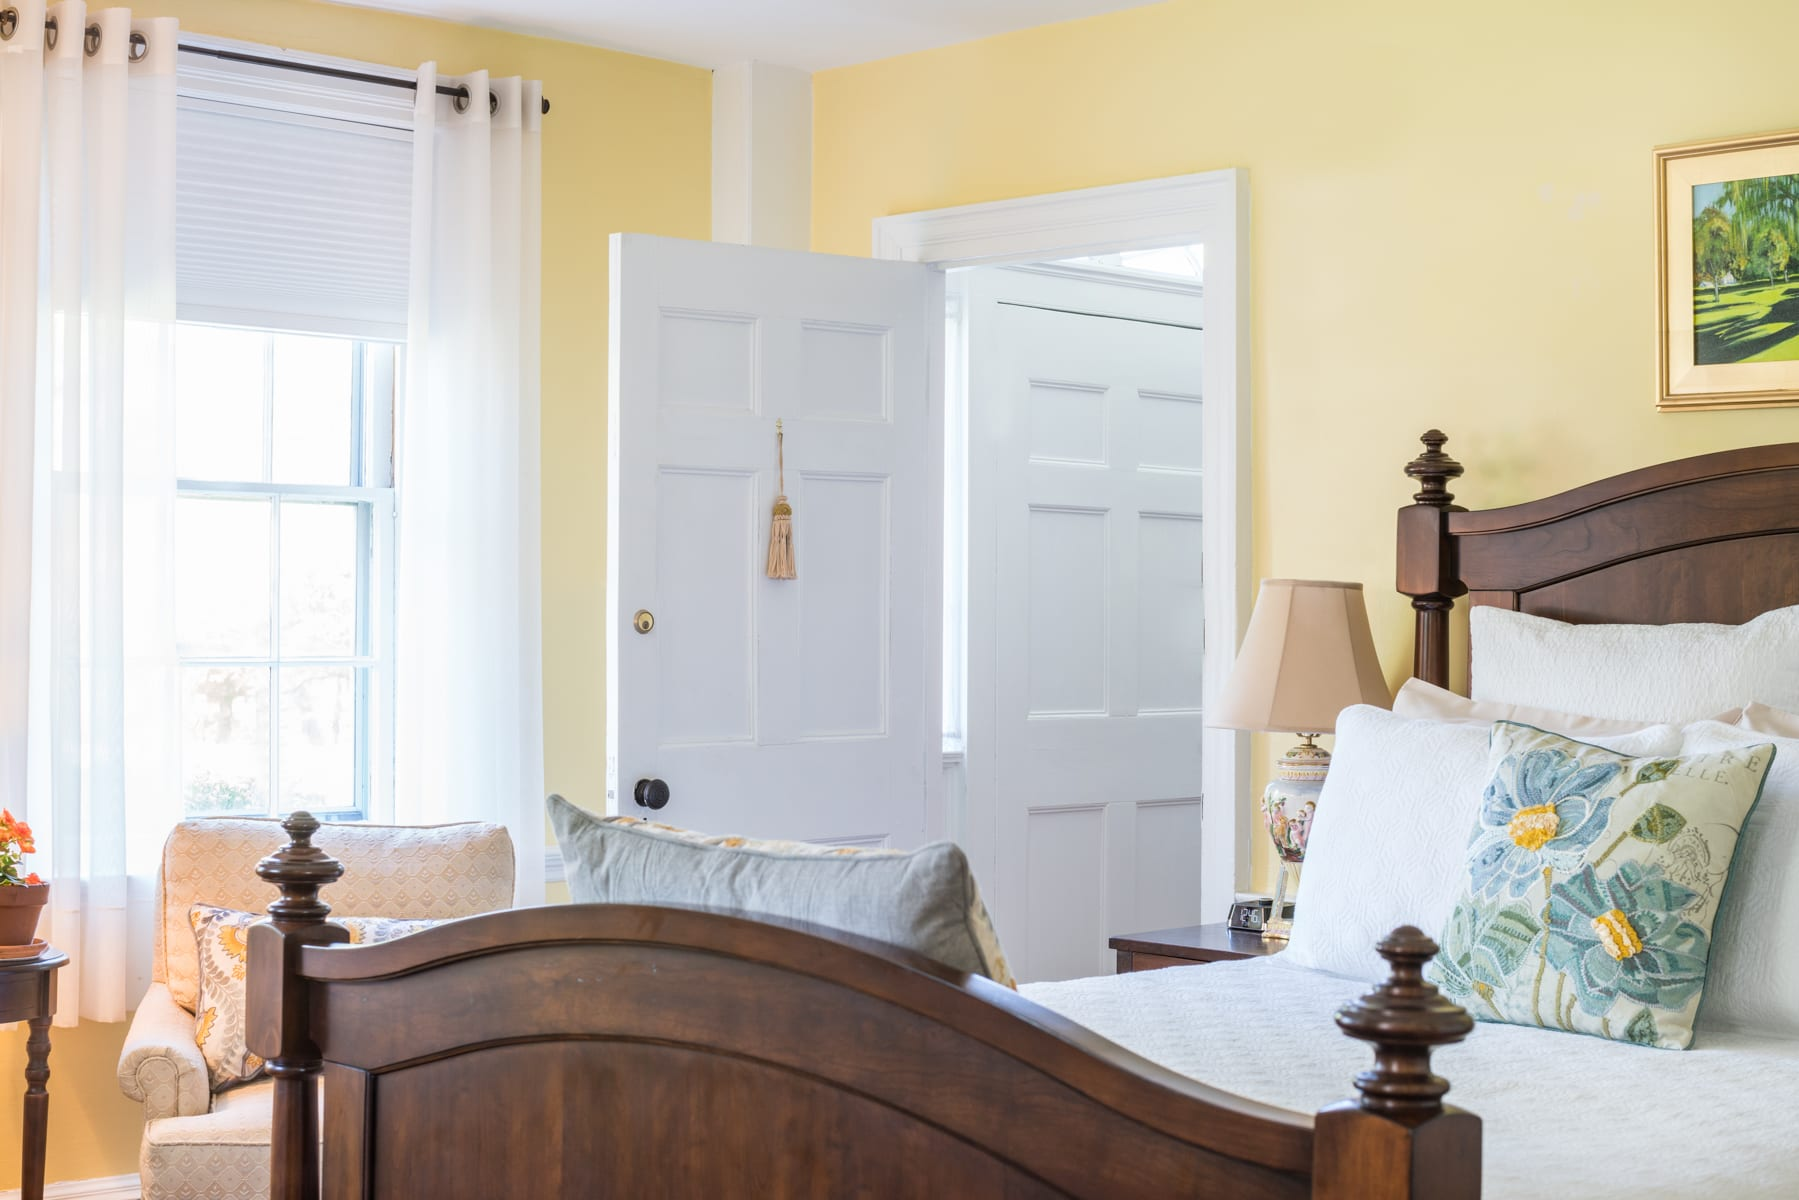 Copeland Room at Candleberry Inn on Cape Cod